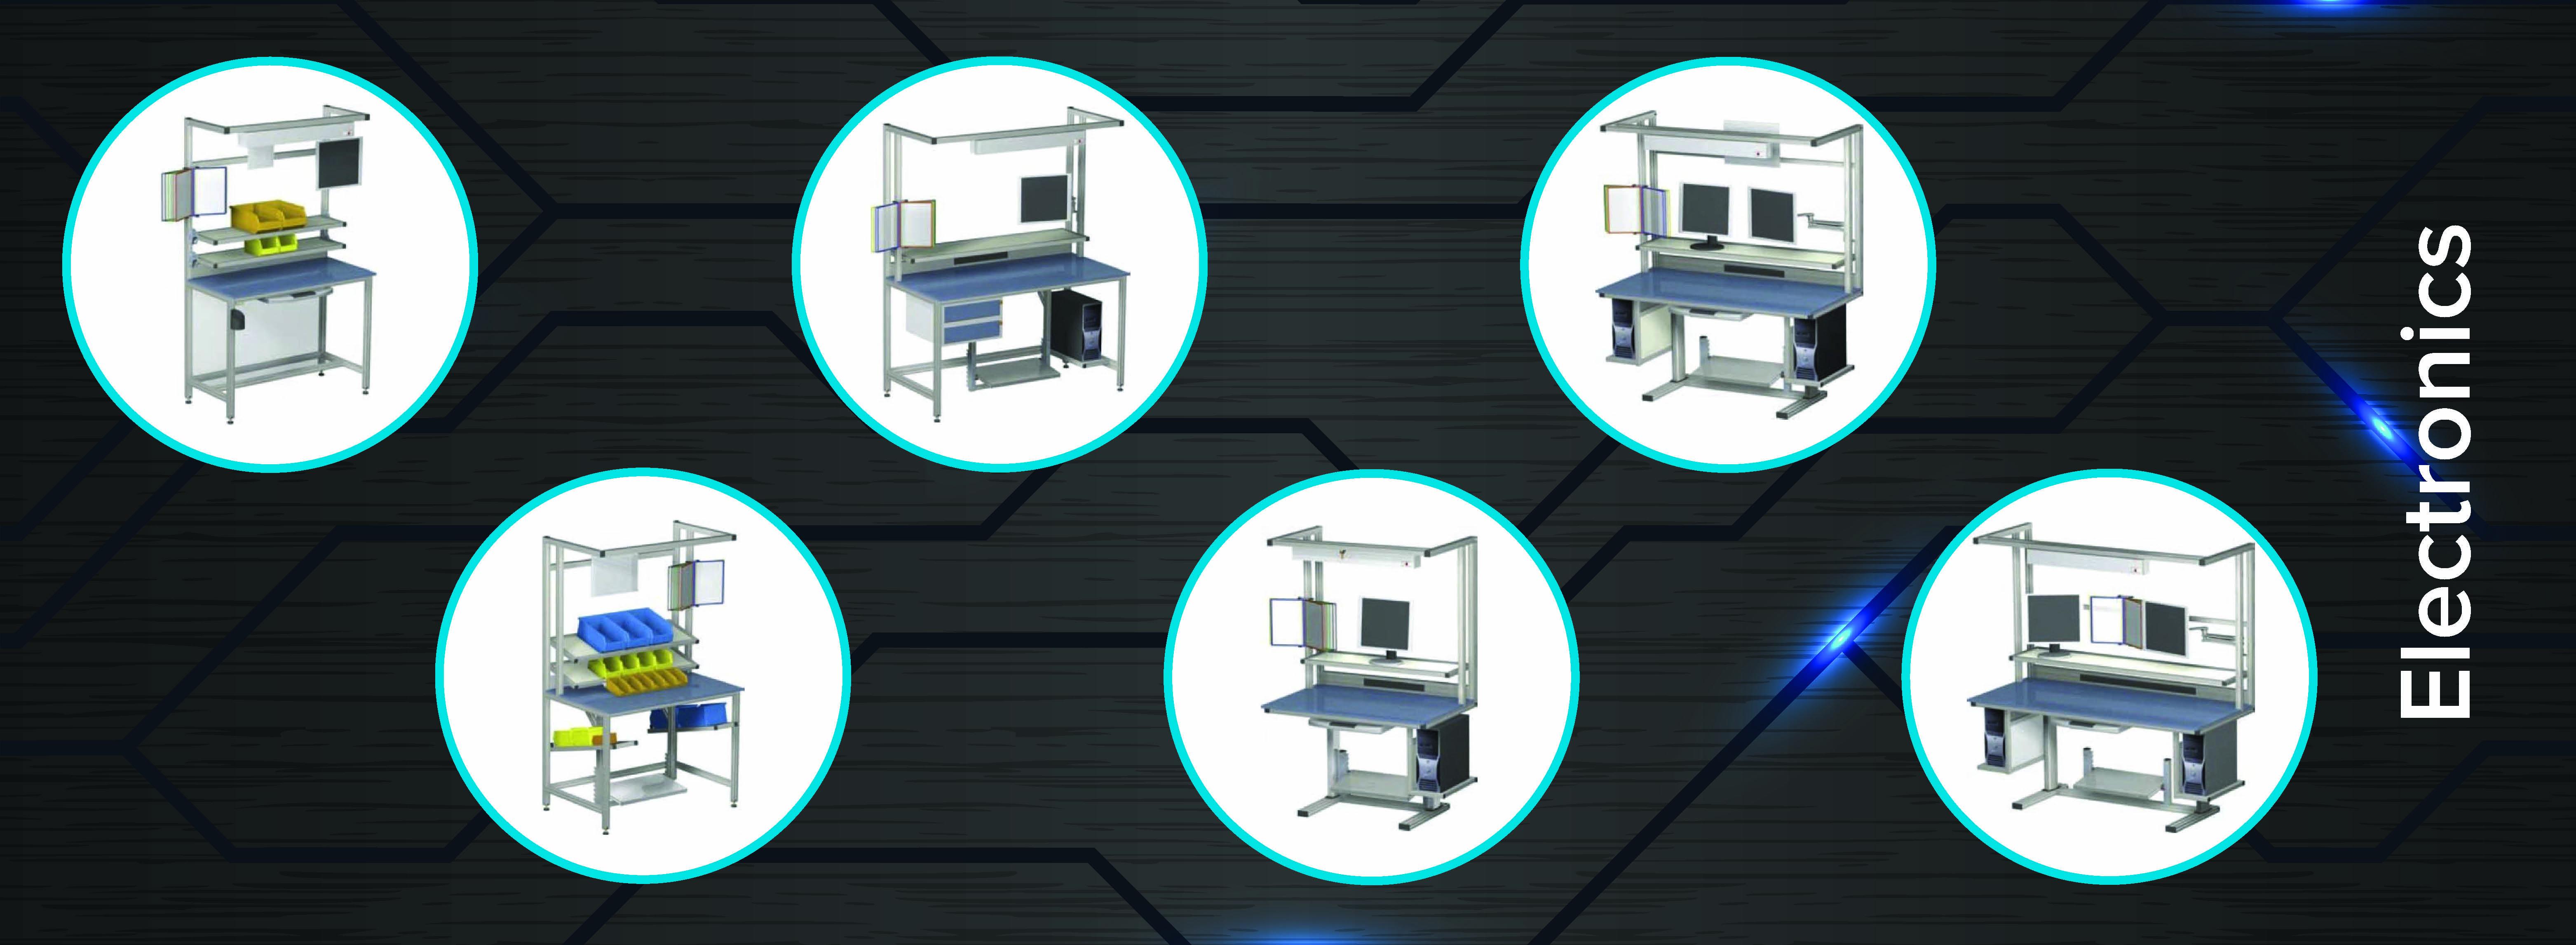 Henchman Workstation Workbench Setup Service